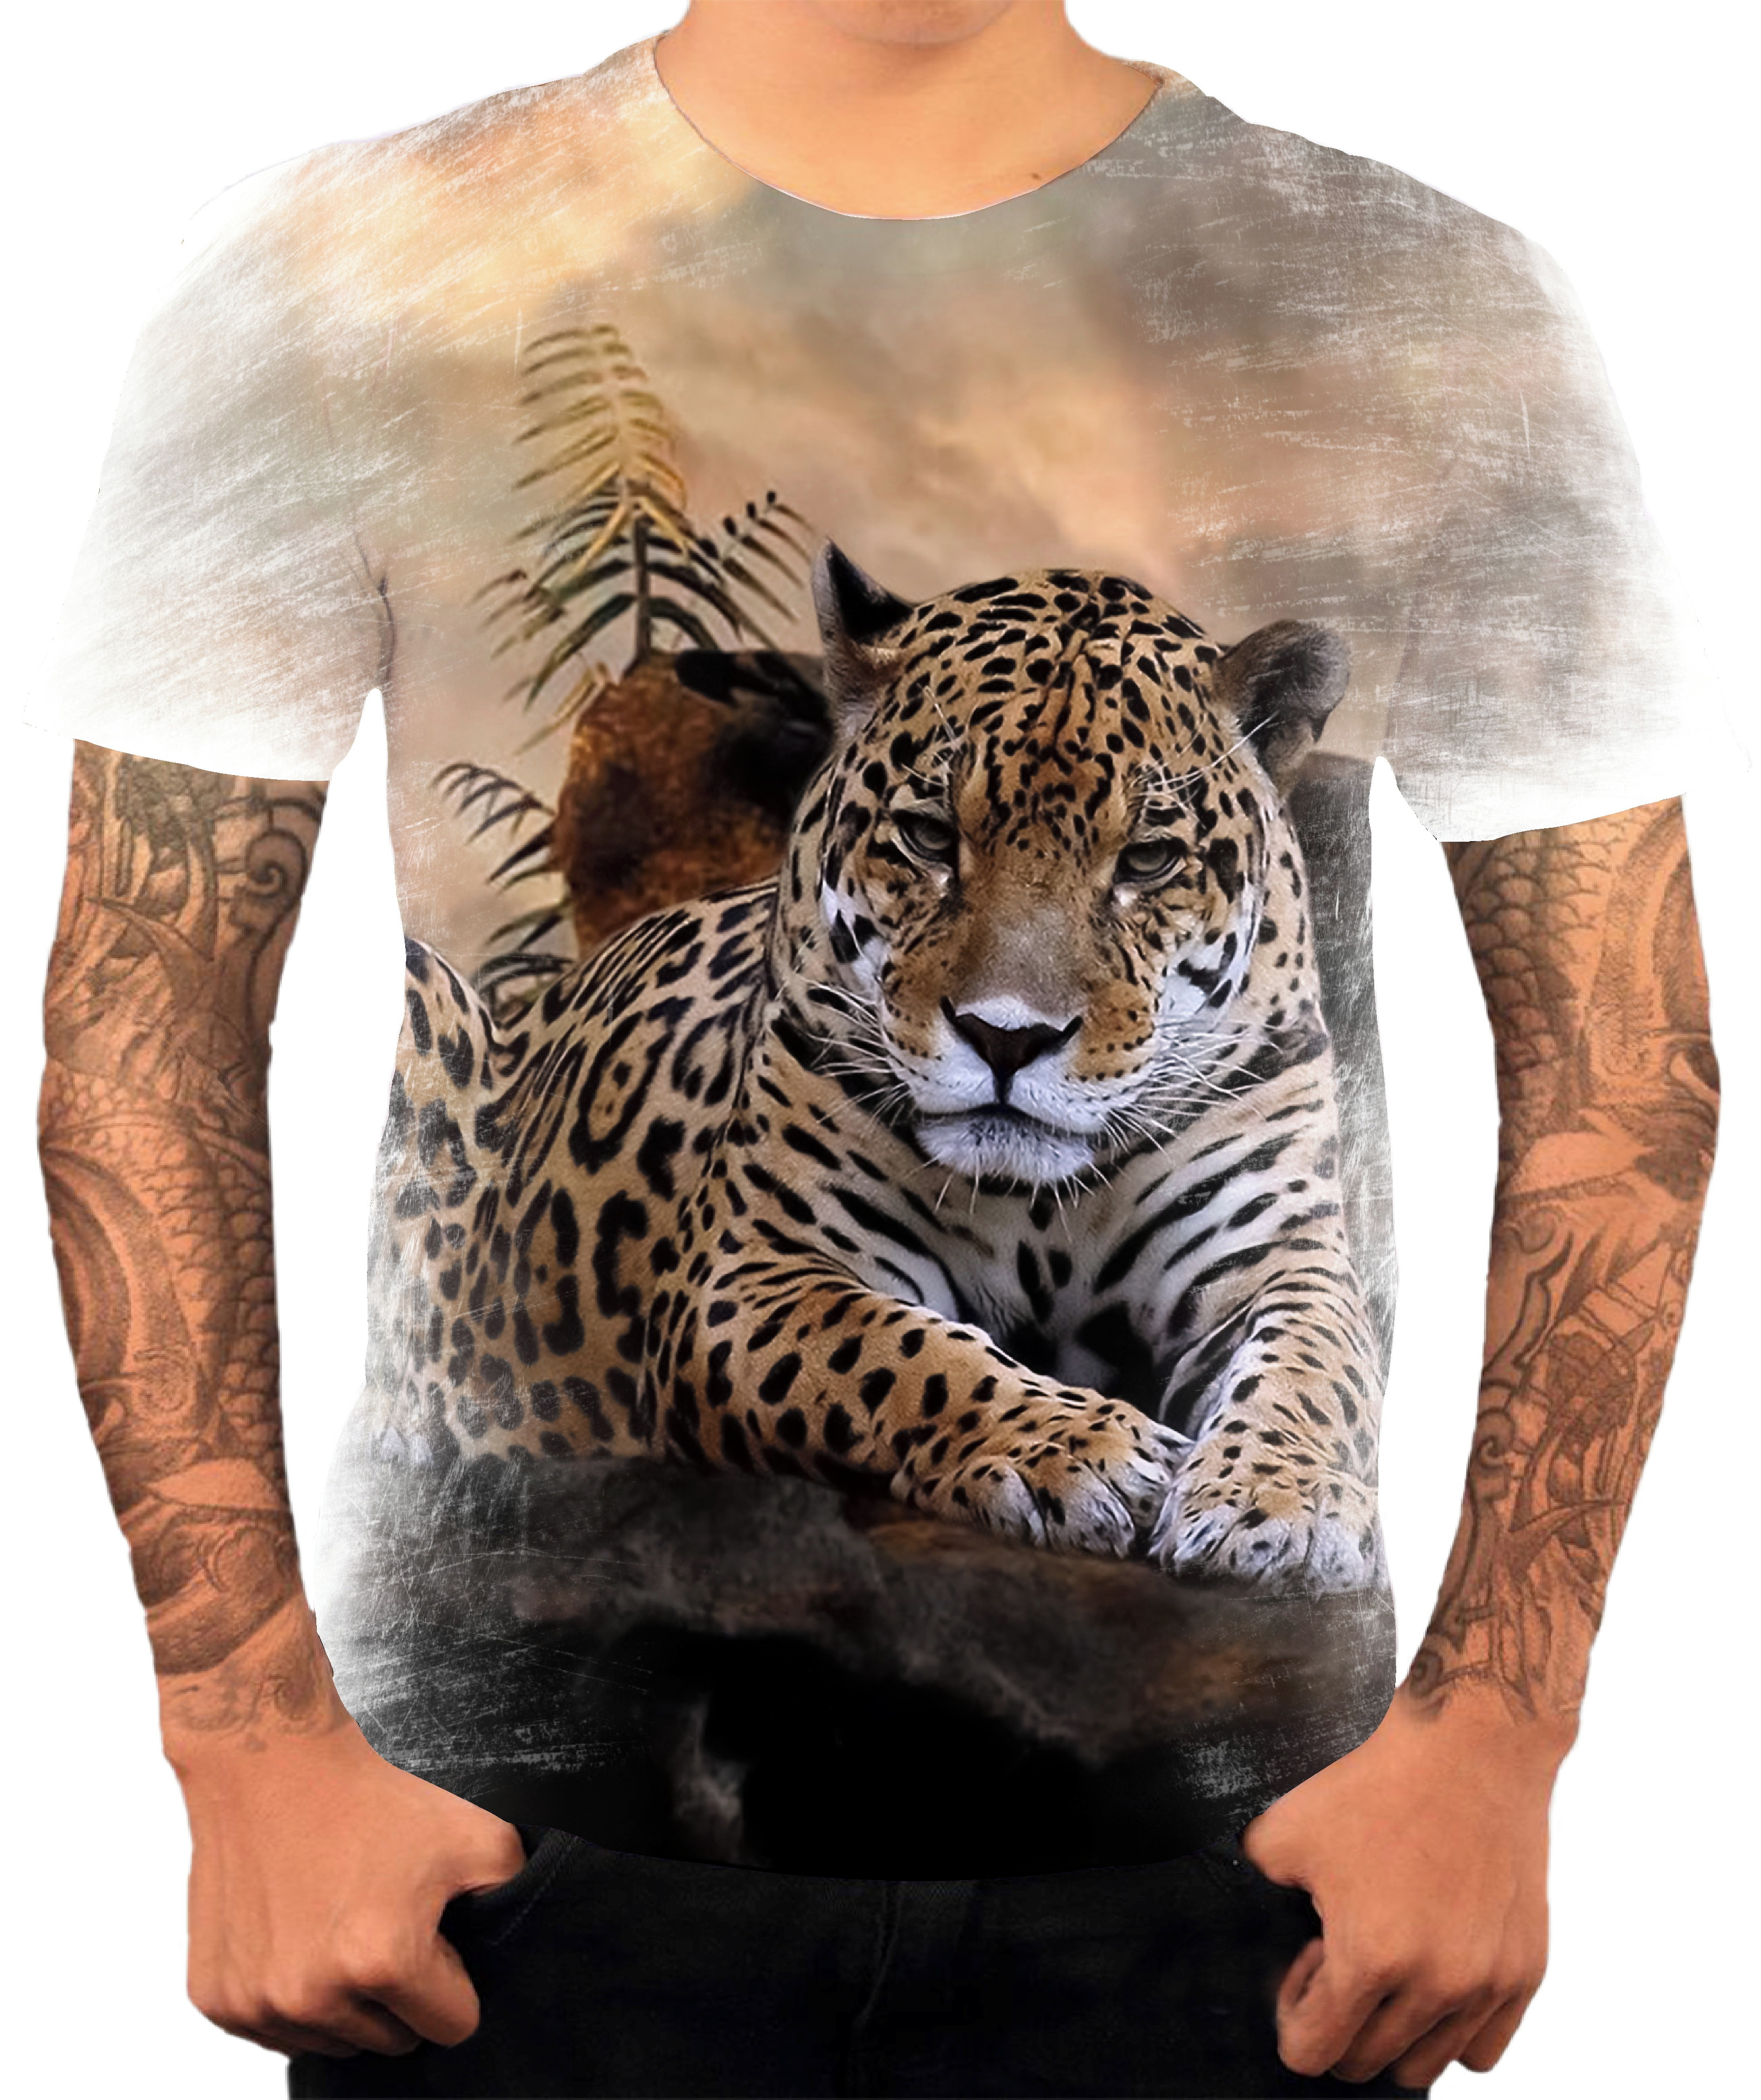 Camisa Camiseta Personaliza Animal Onca Pintada 02 No Elo7